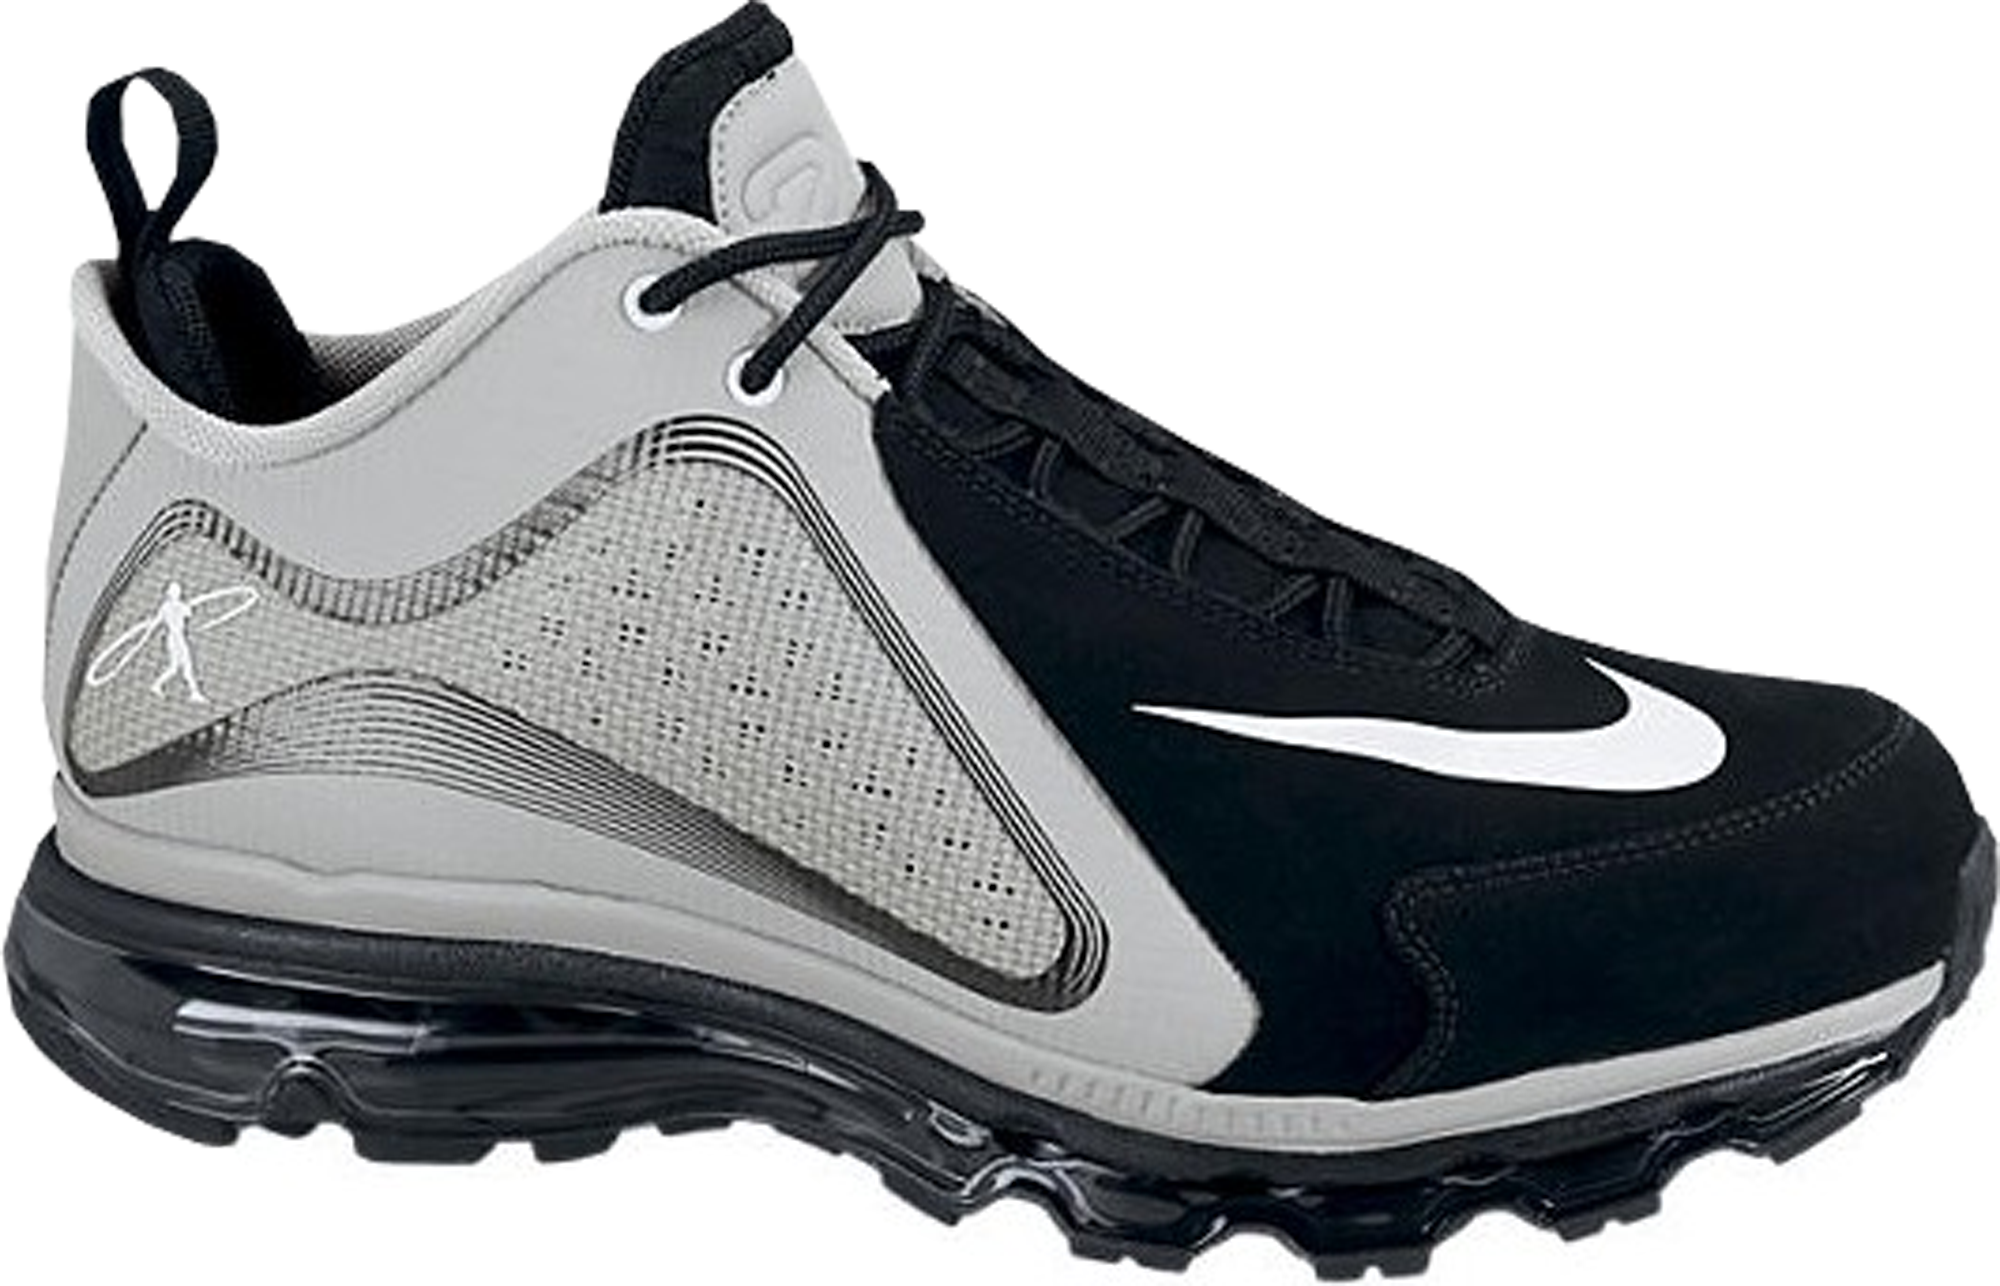 Nike Air Griffey Max 360 Black Wolf